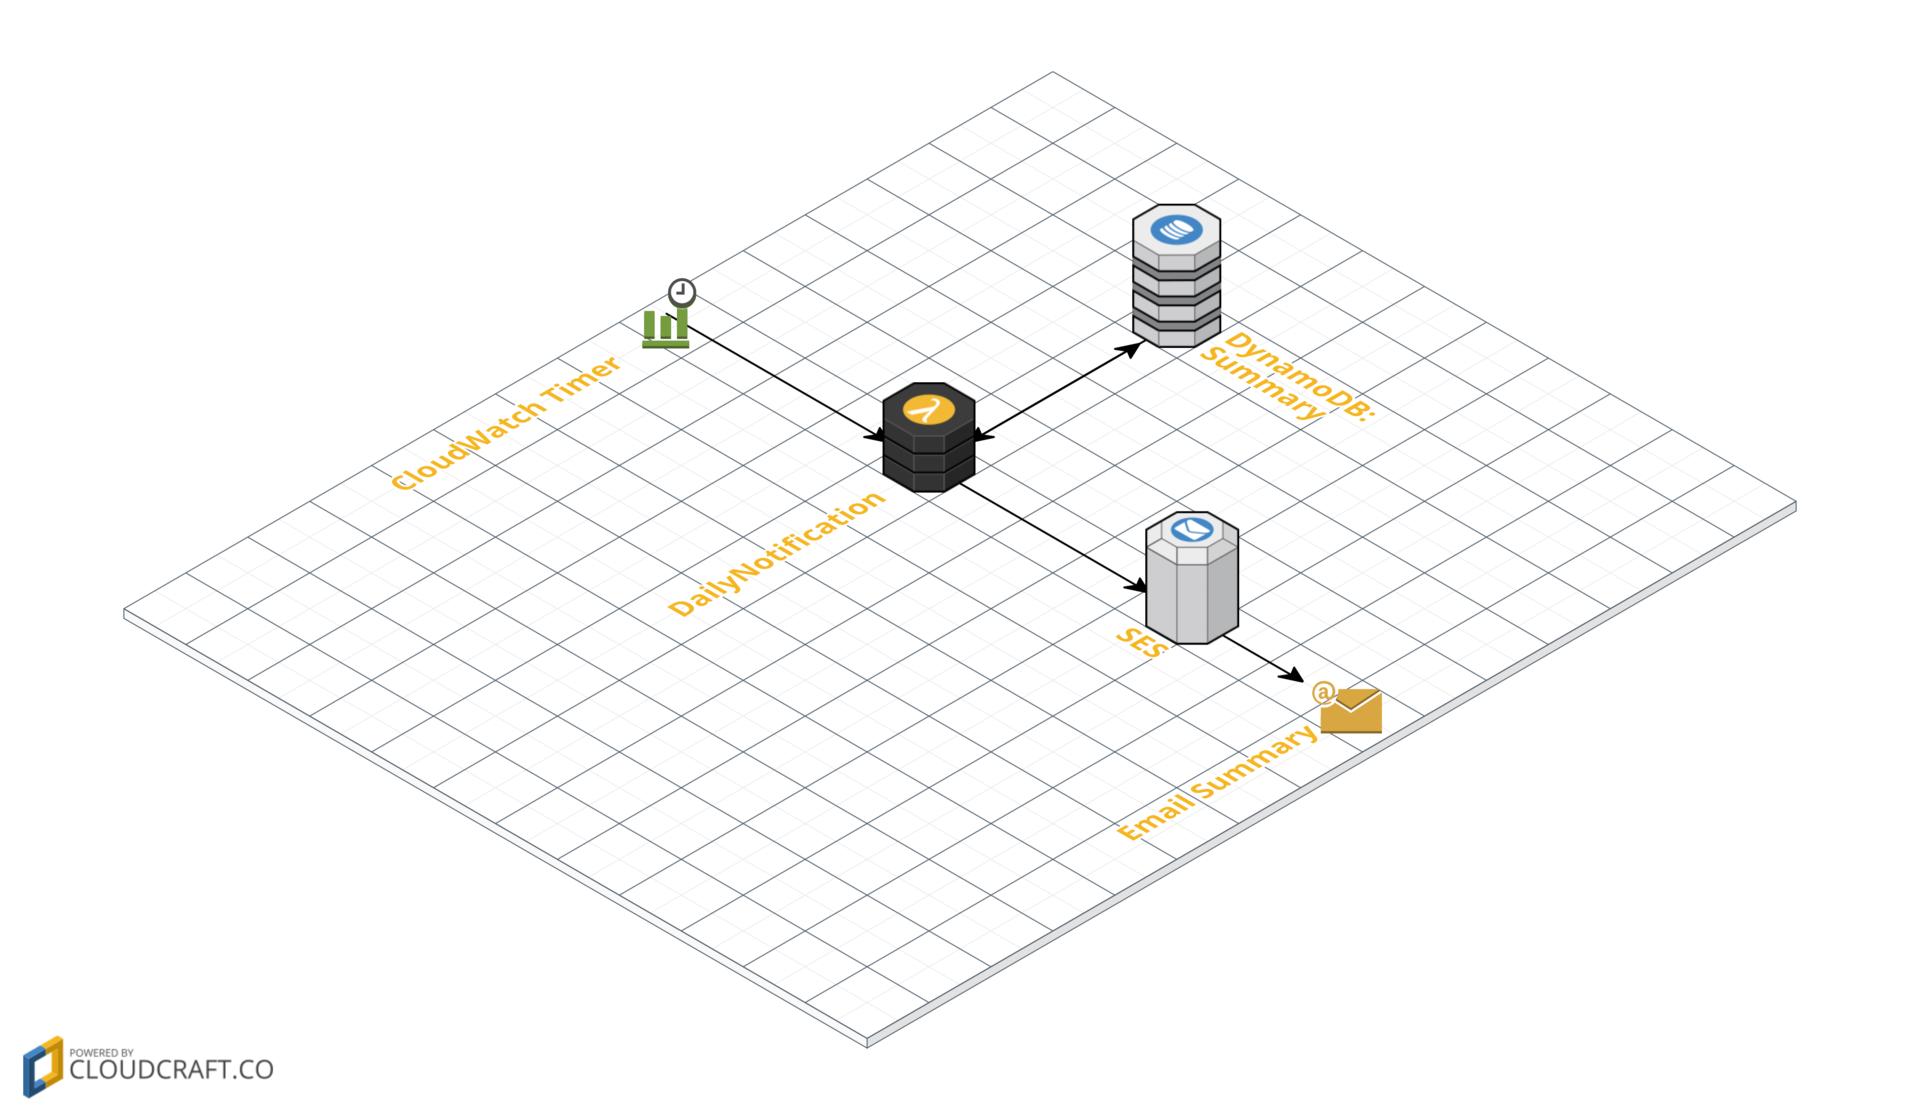 Простой трекер семейного бюджета с помощью AWS SES, Lambda и DynamoDB (и Route53) - 4